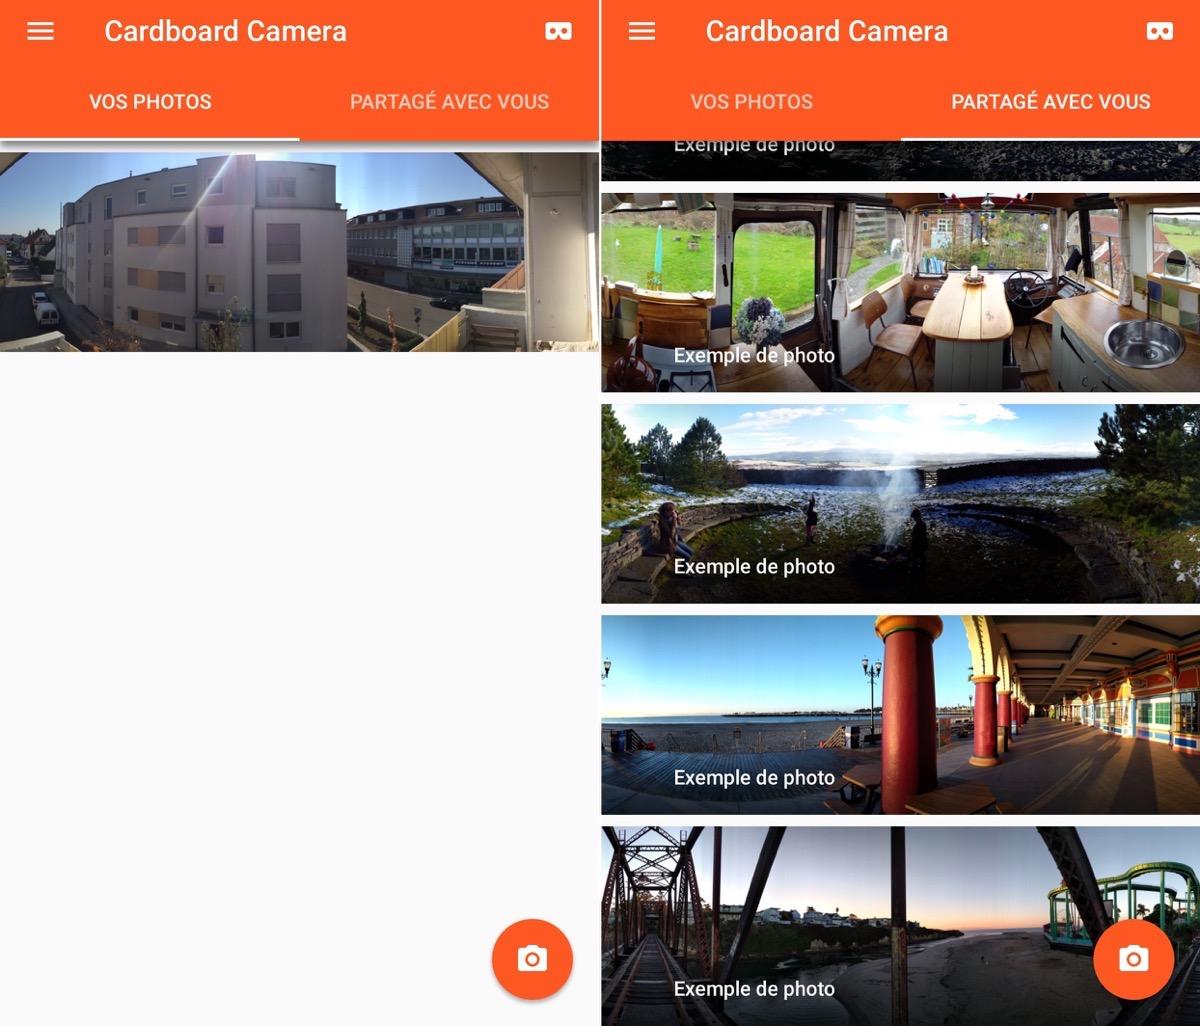 cardboard camera l 39 app de google pour prendre et visionner des photos en vr est disponible. Black Bedroom Furniture Sets. Home Design Ideas